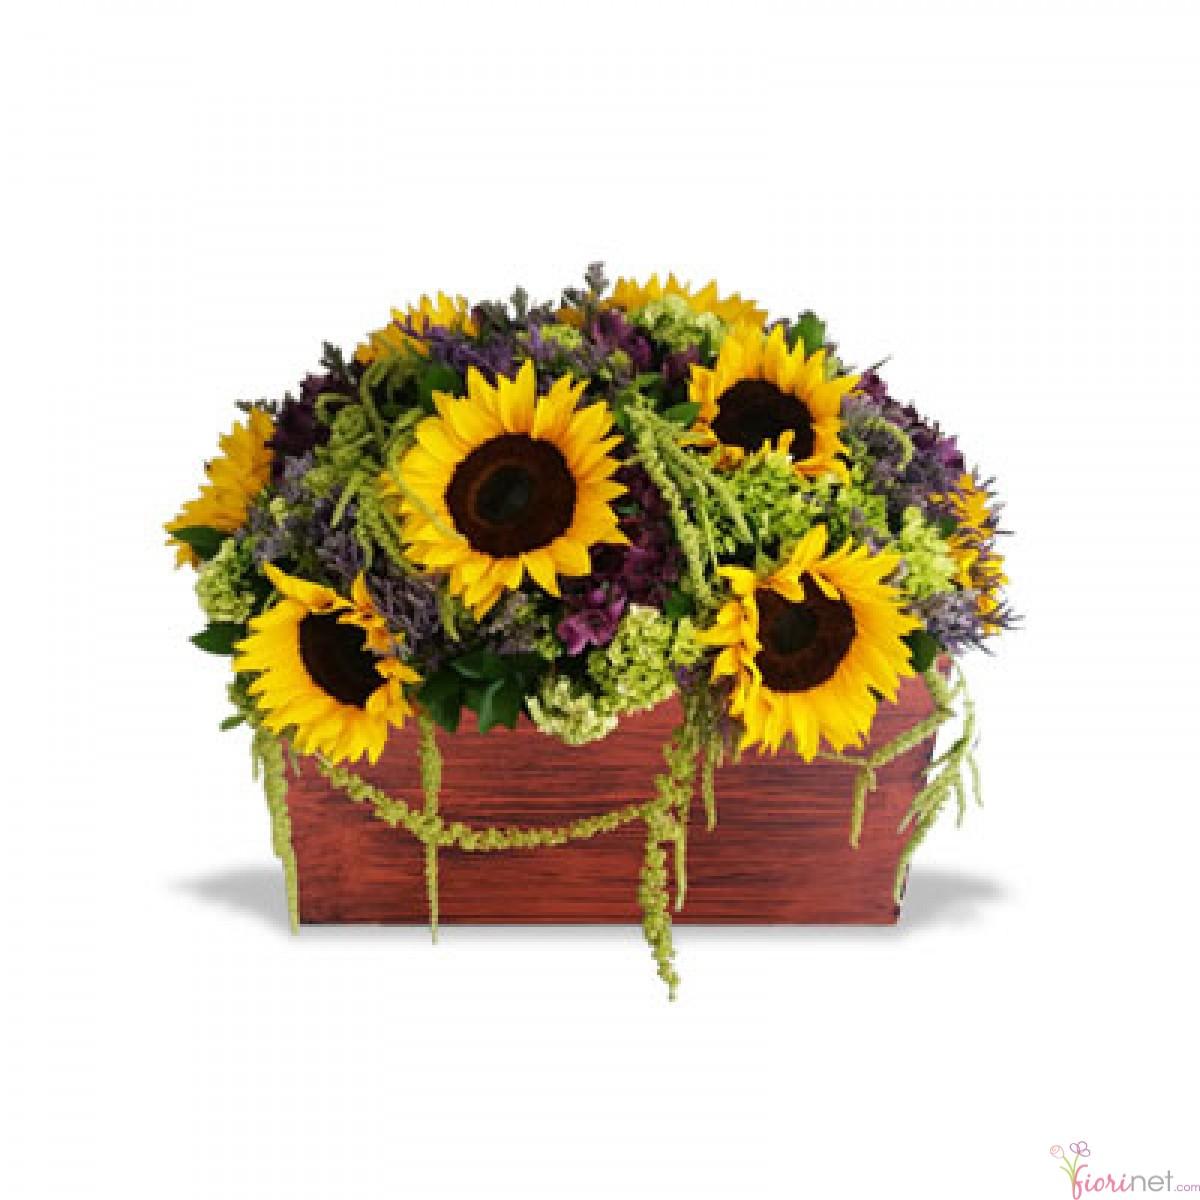 Flores Fiorinet 174 Florerias Quot Girasoles Vintage Quot Envio